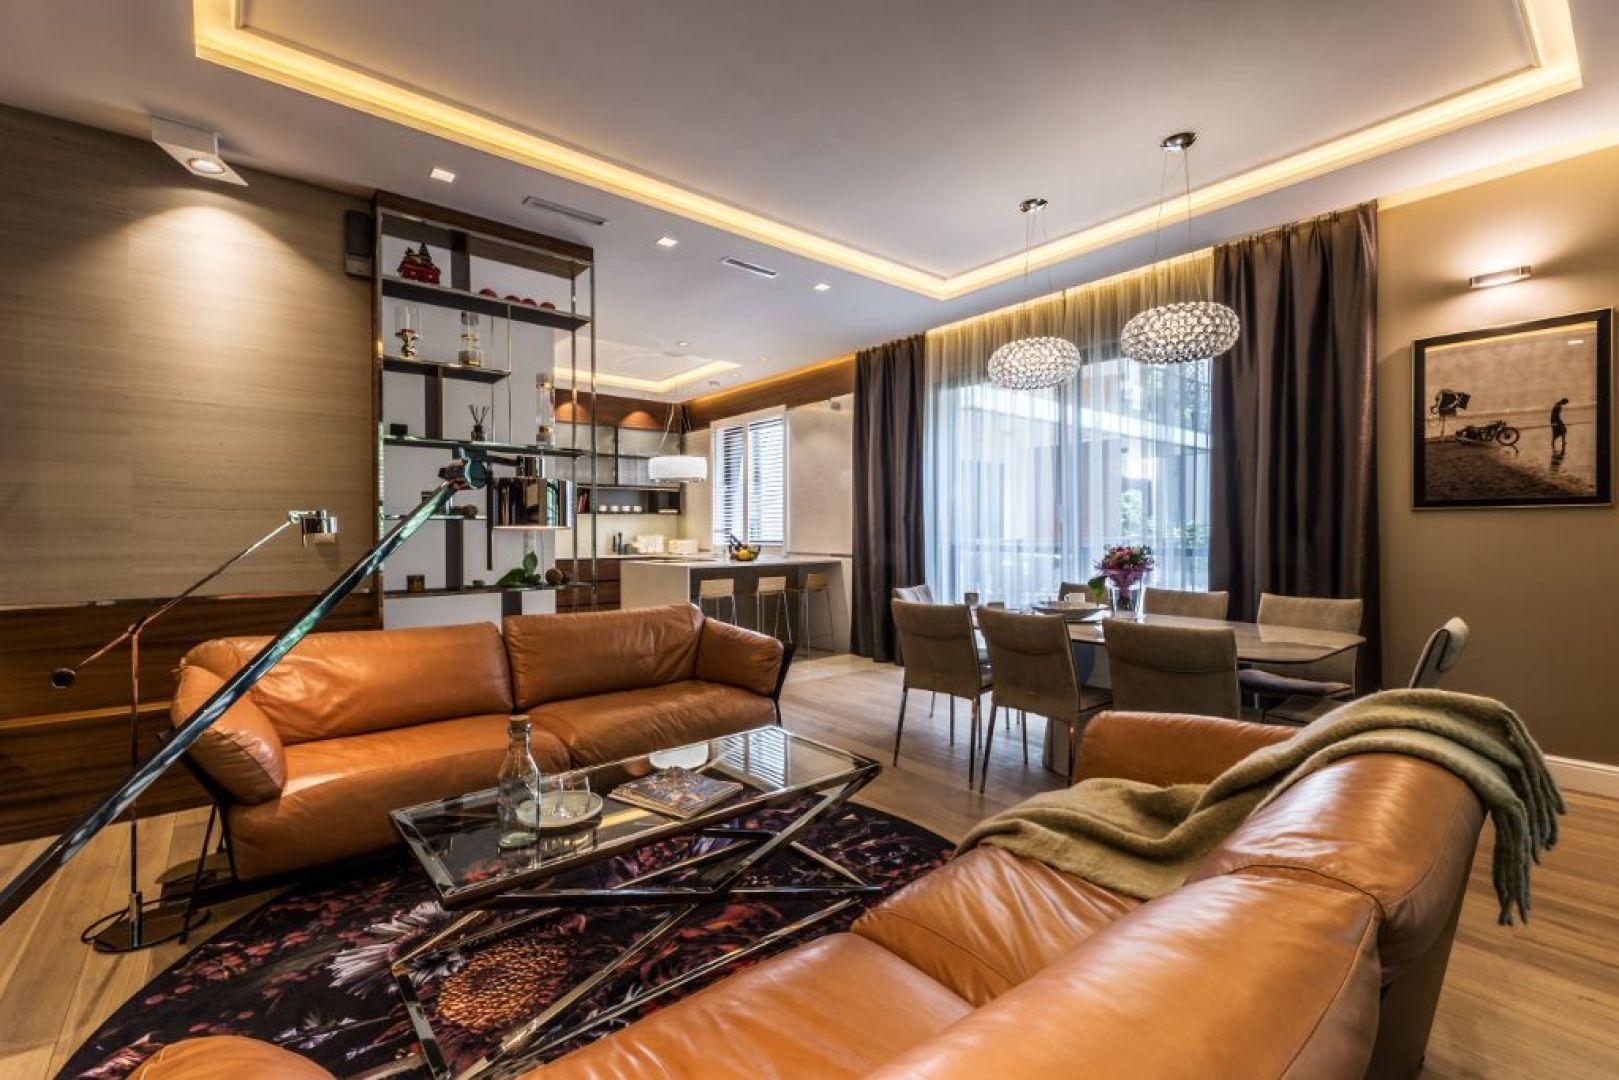 Centralnym punktem salonu są wygodne skórzane sofy. Fot. Viva Design